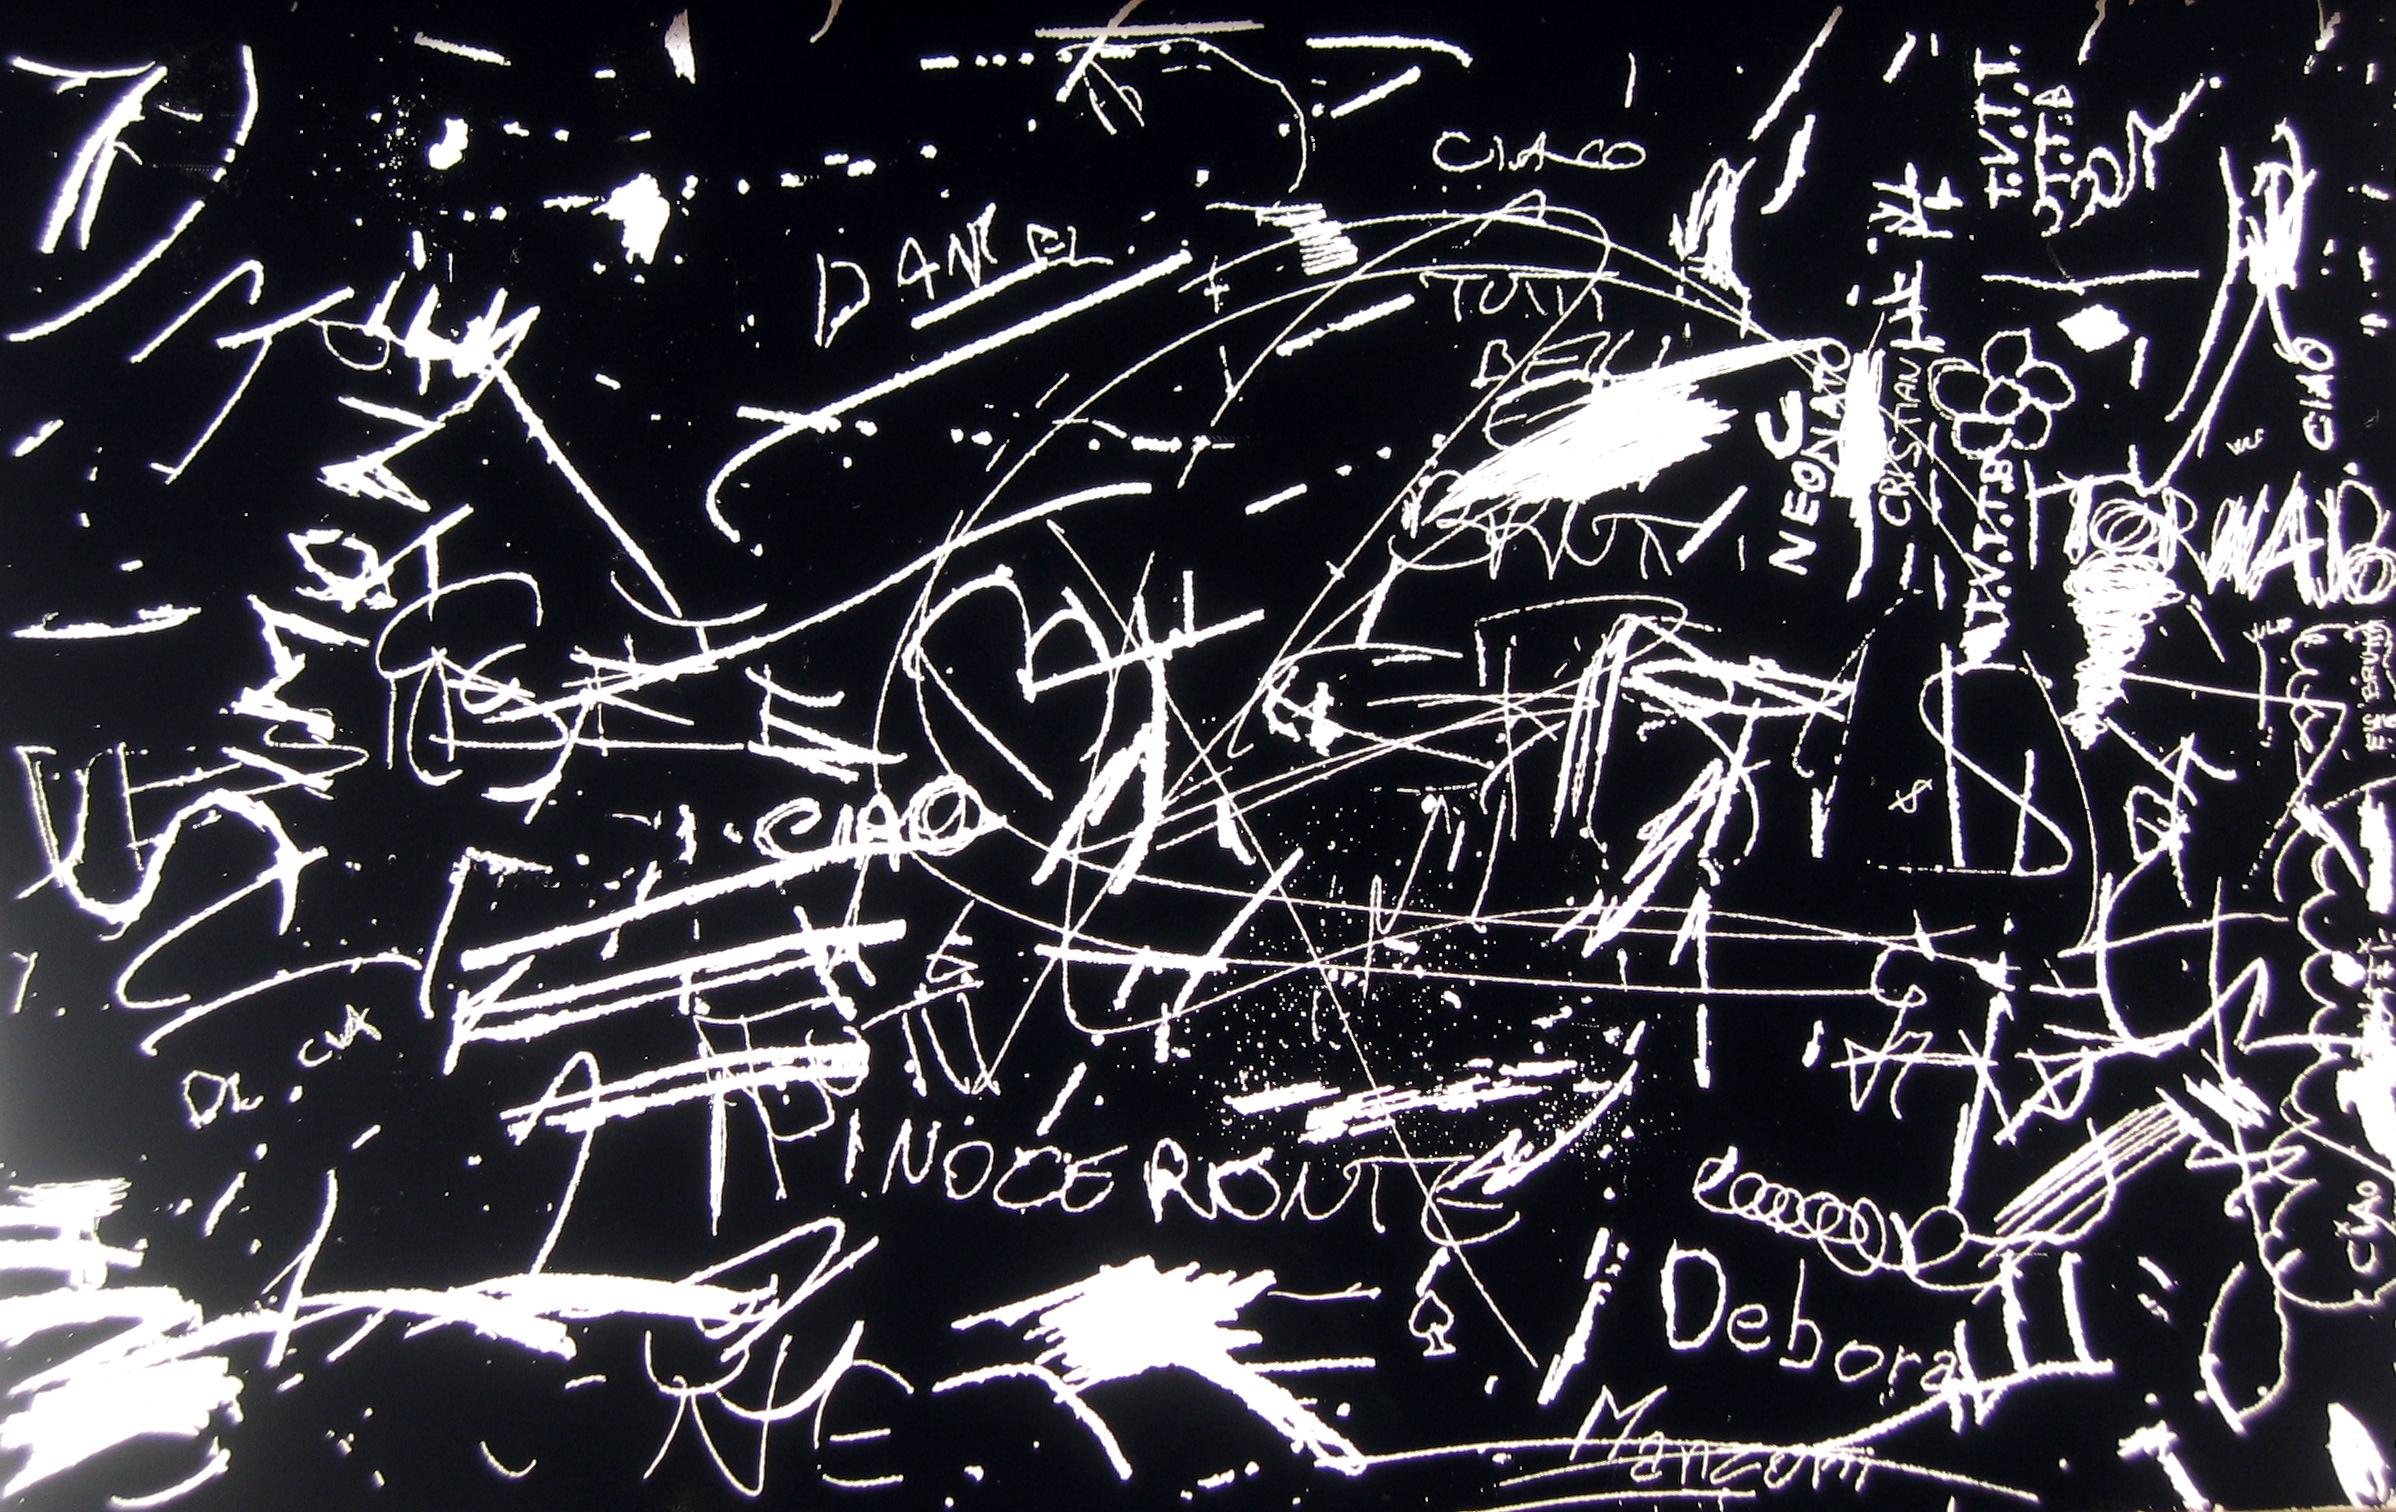 Salvatore Falci, 1986 - 2006, Vetro Elementari DEBORA, opalina, cera, vernice e led, cm. 65x46